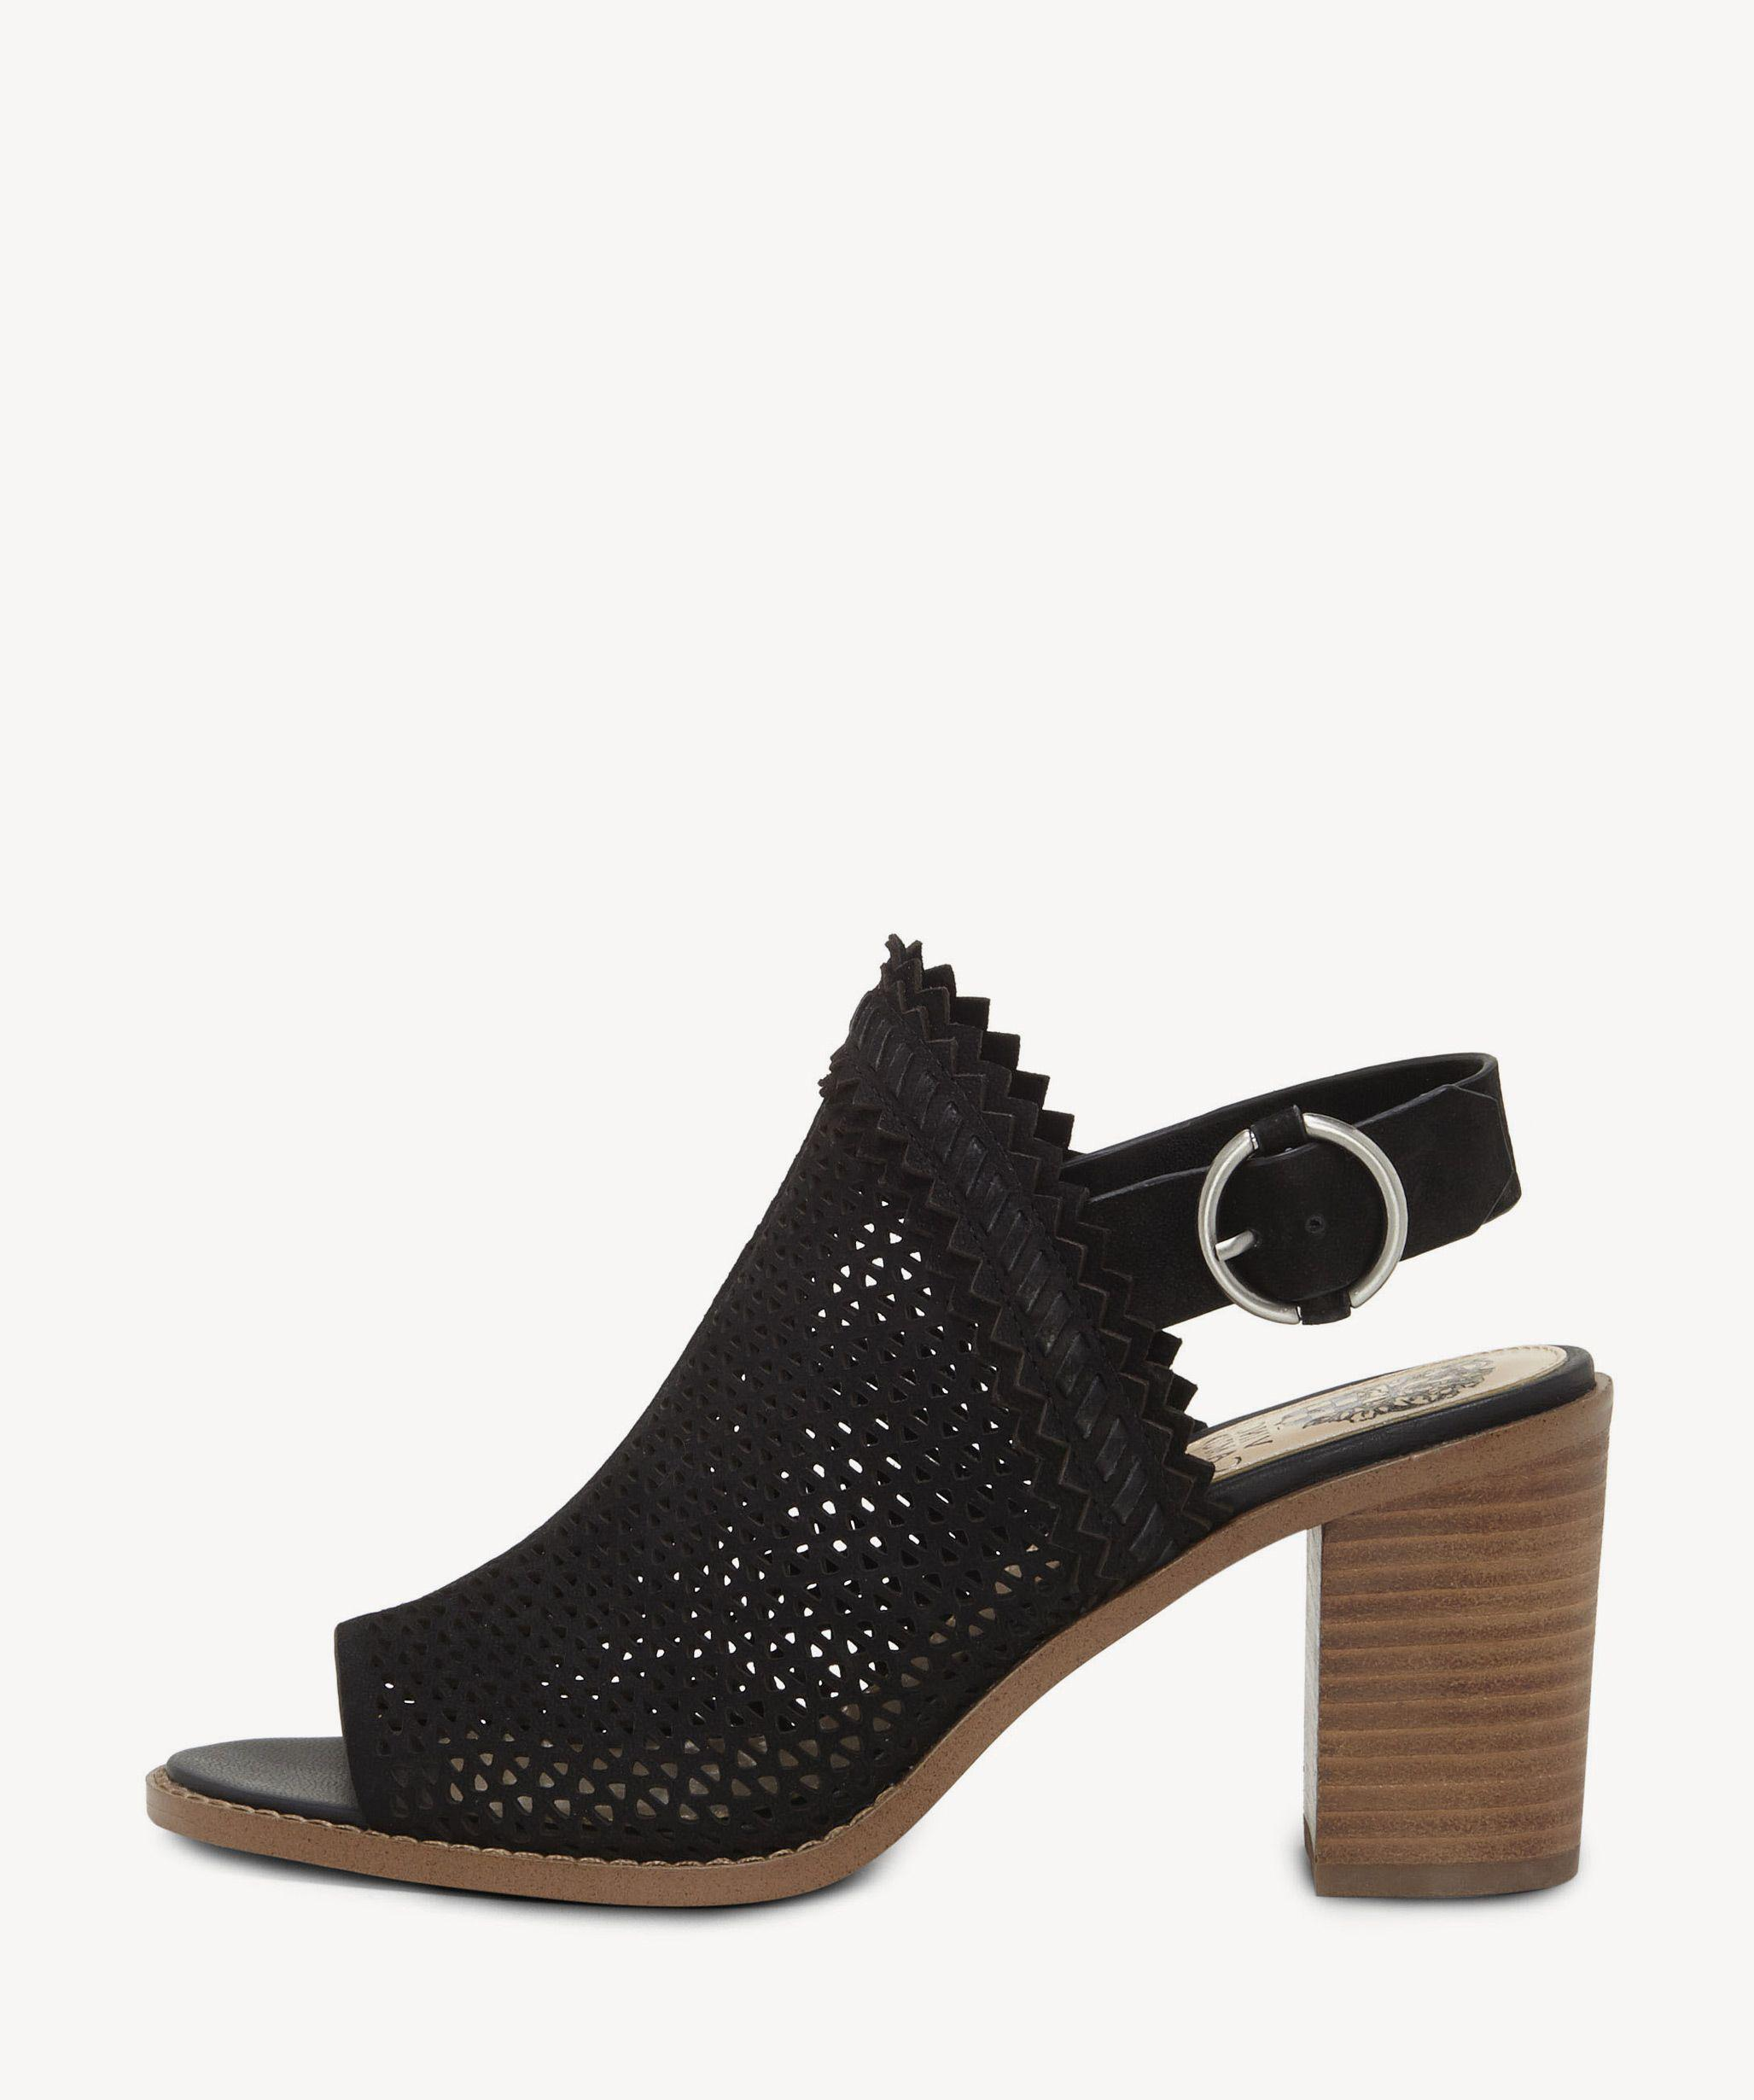 71c1648d386 Lyst - Vince Camuto Tricinda Slingback Block Heel Sandal in Black - Save  41.52542372881356%